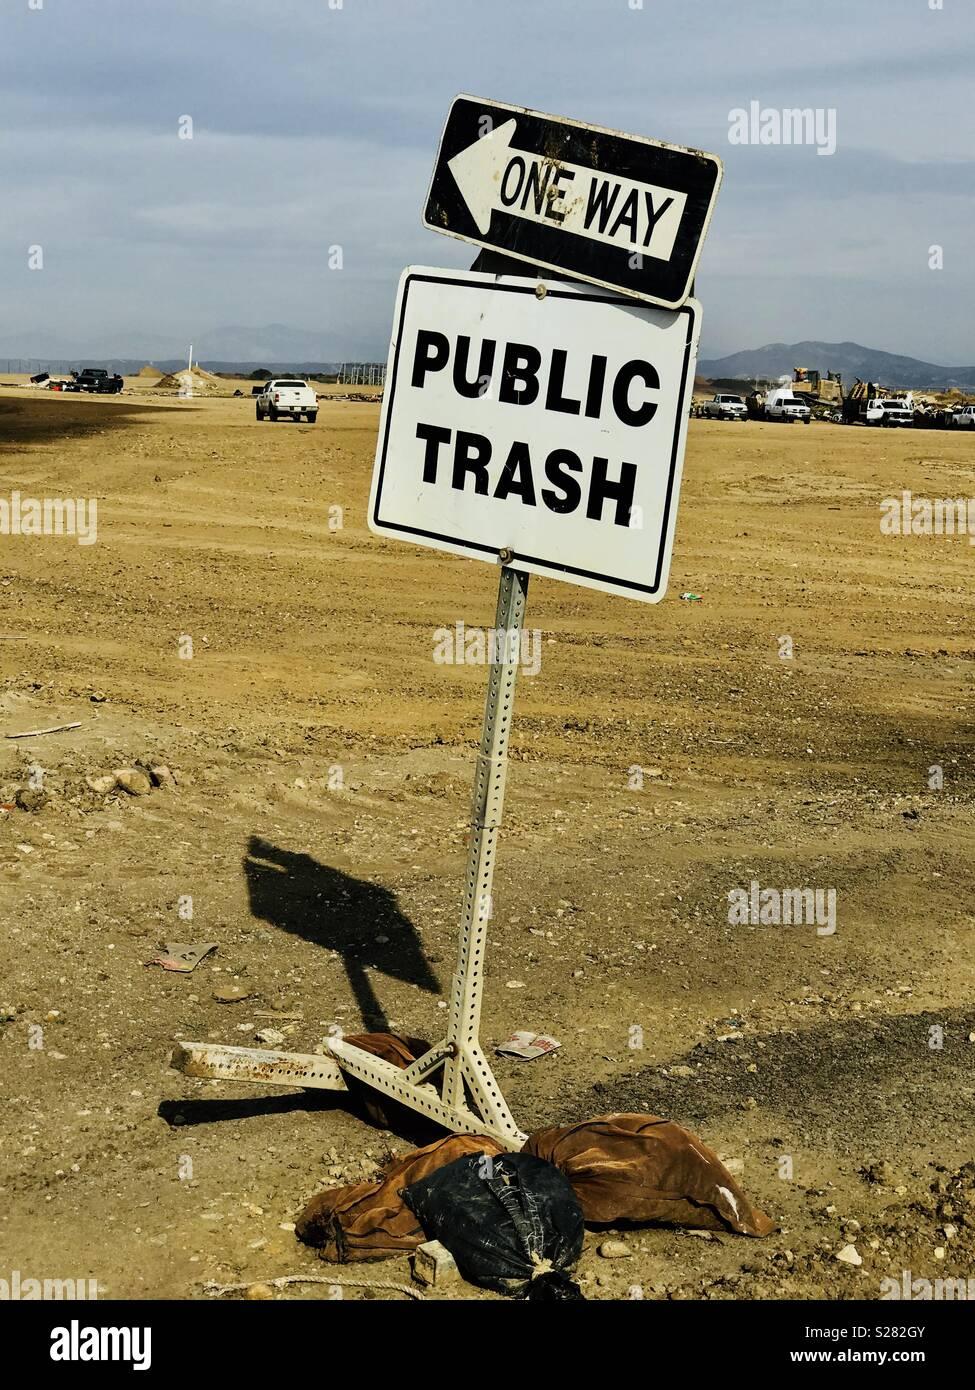 Trash is treasure. - Stock Image